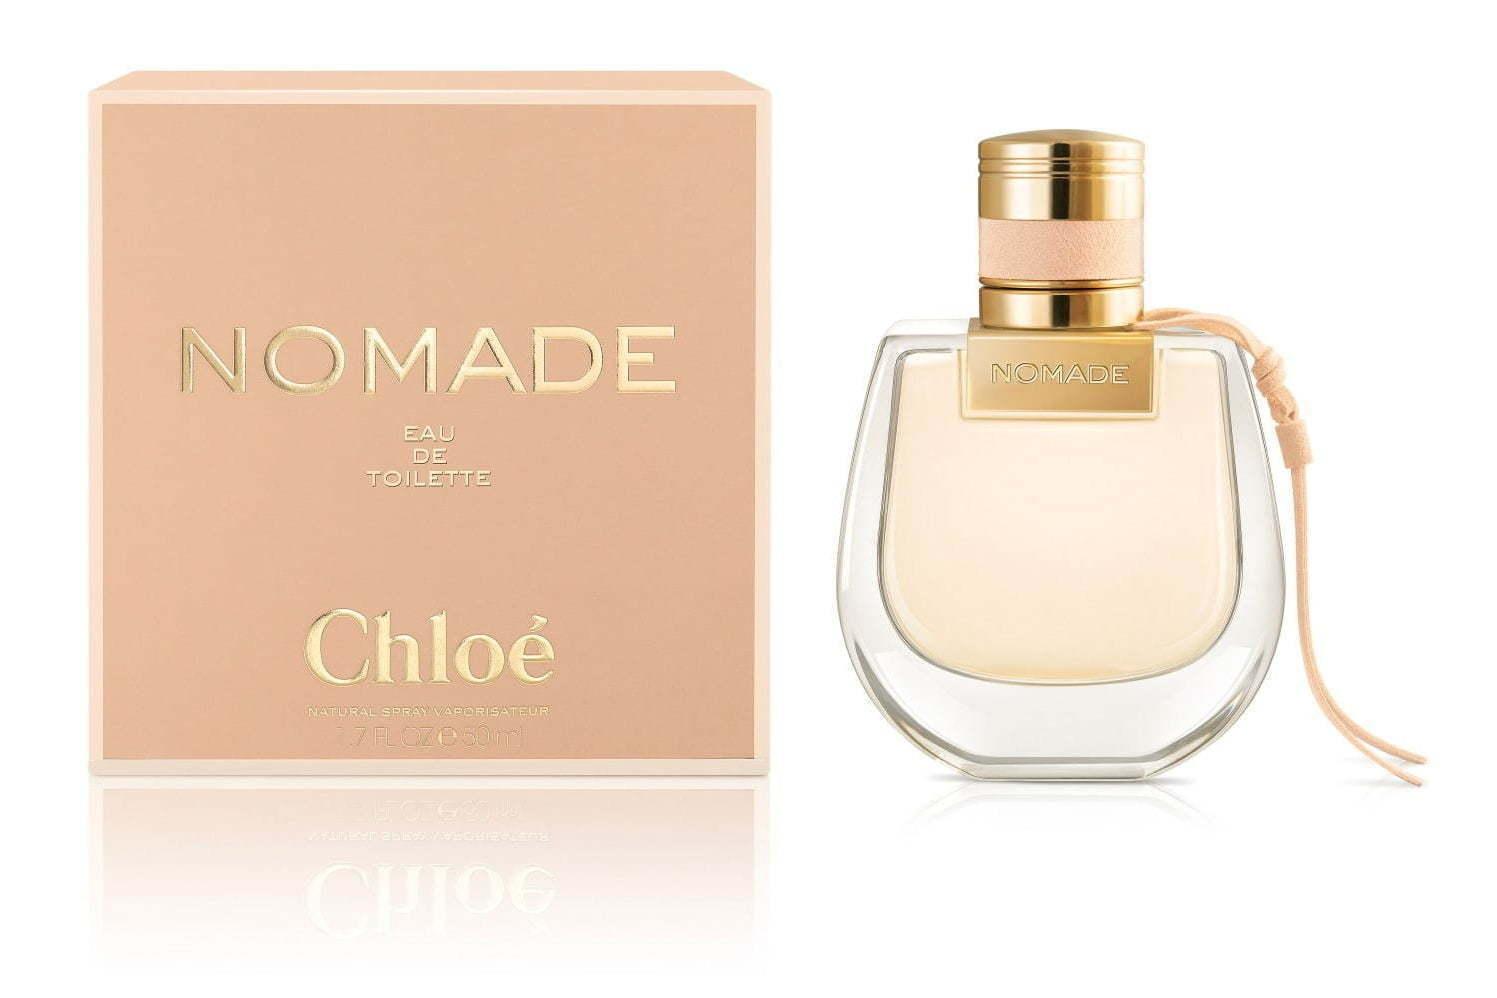 new concept e1cec 4469c クロエ : Chloé - ファッションプレス